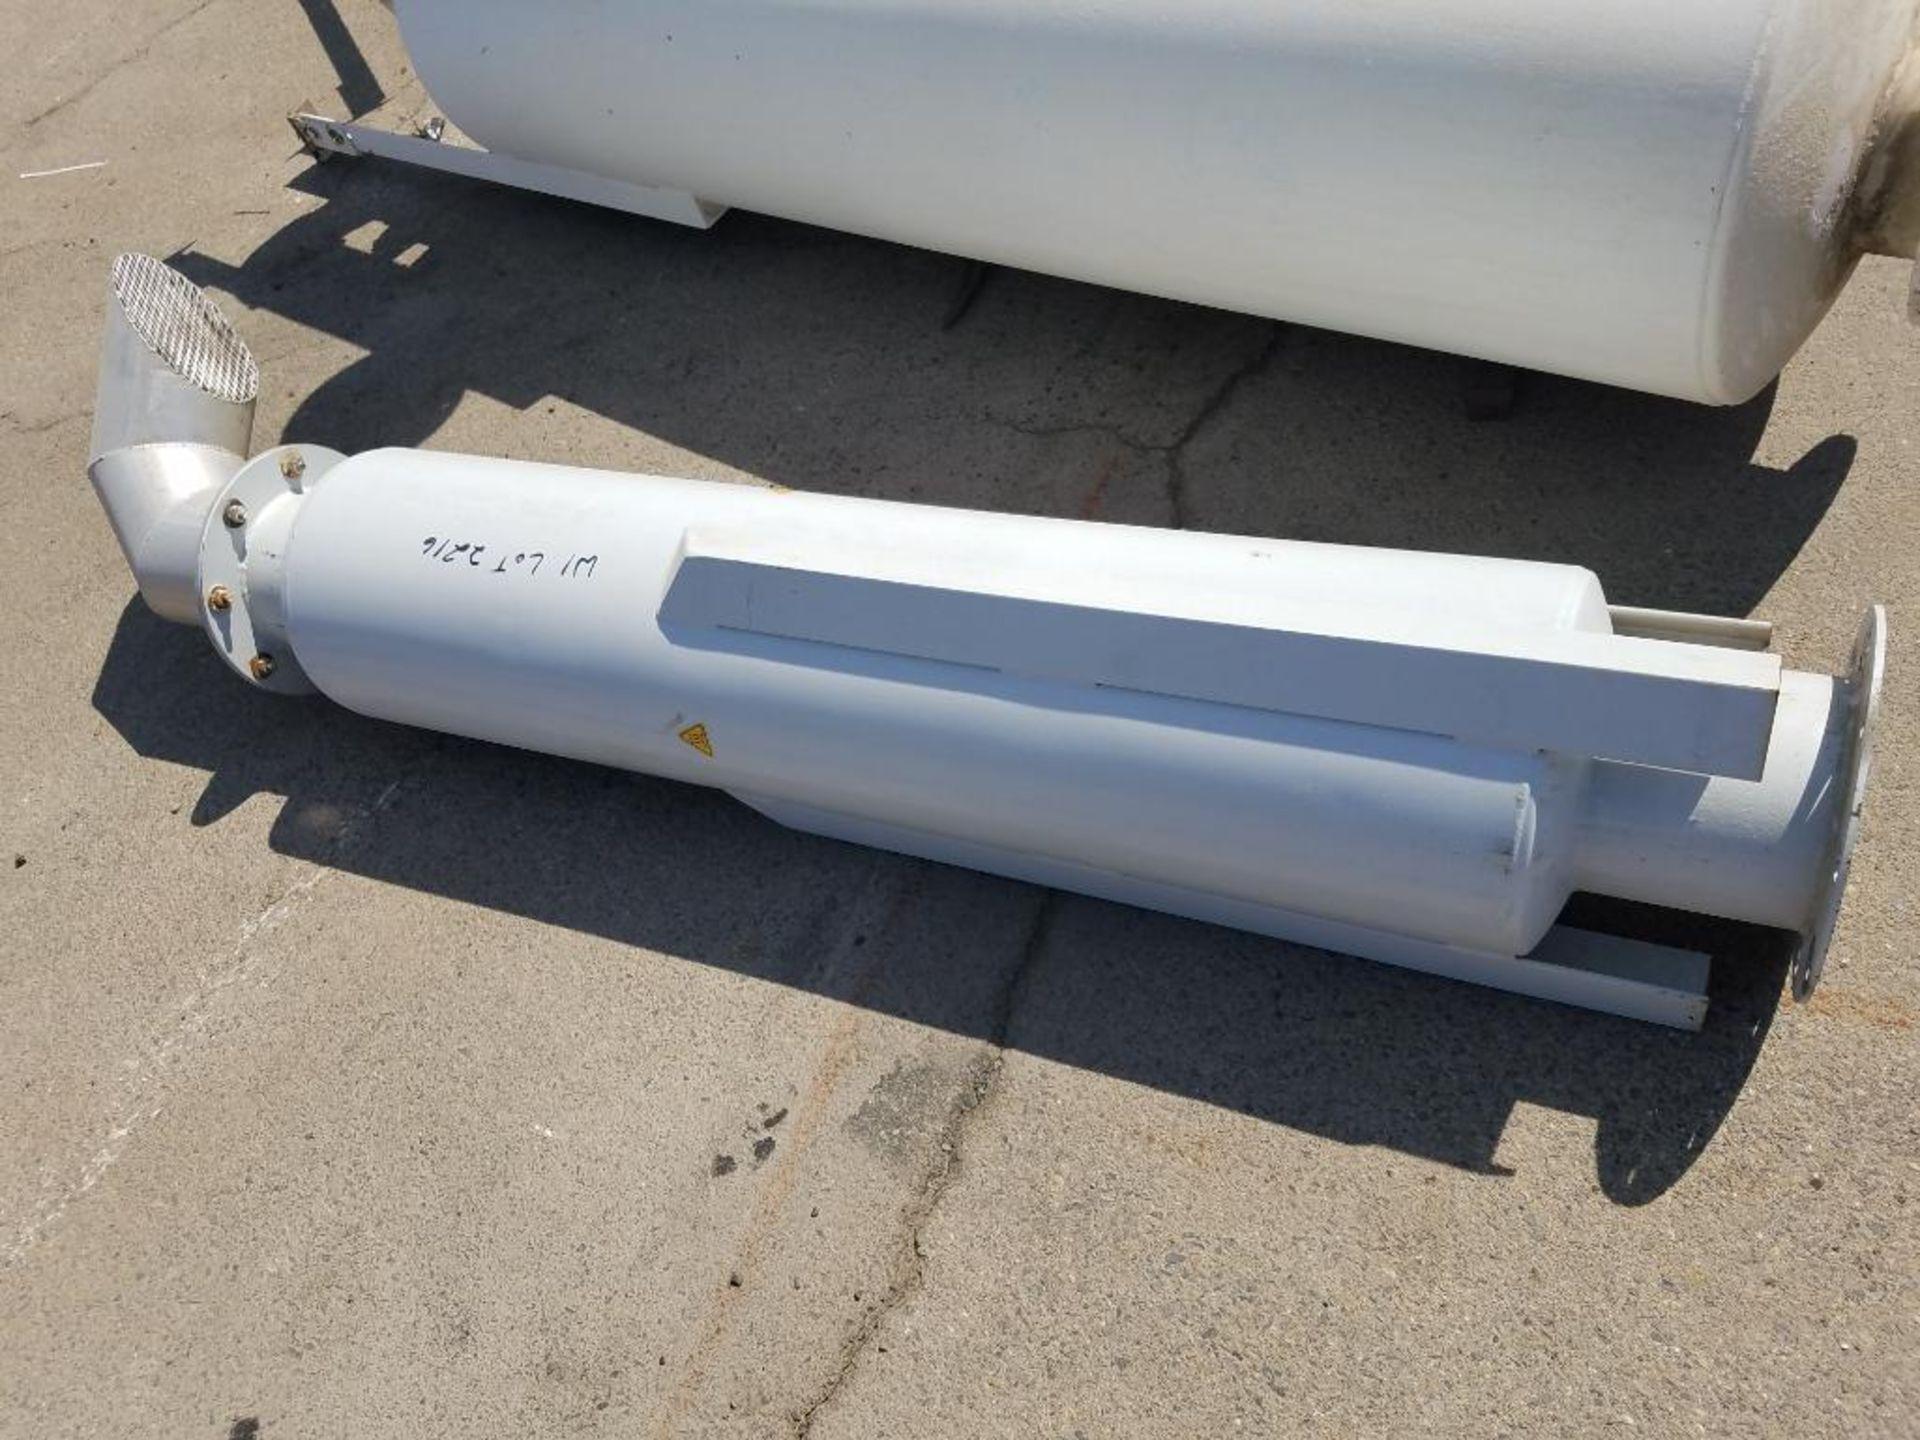 Gardner Denver Sutorbilt rotary positive blower - Image 4 of 7